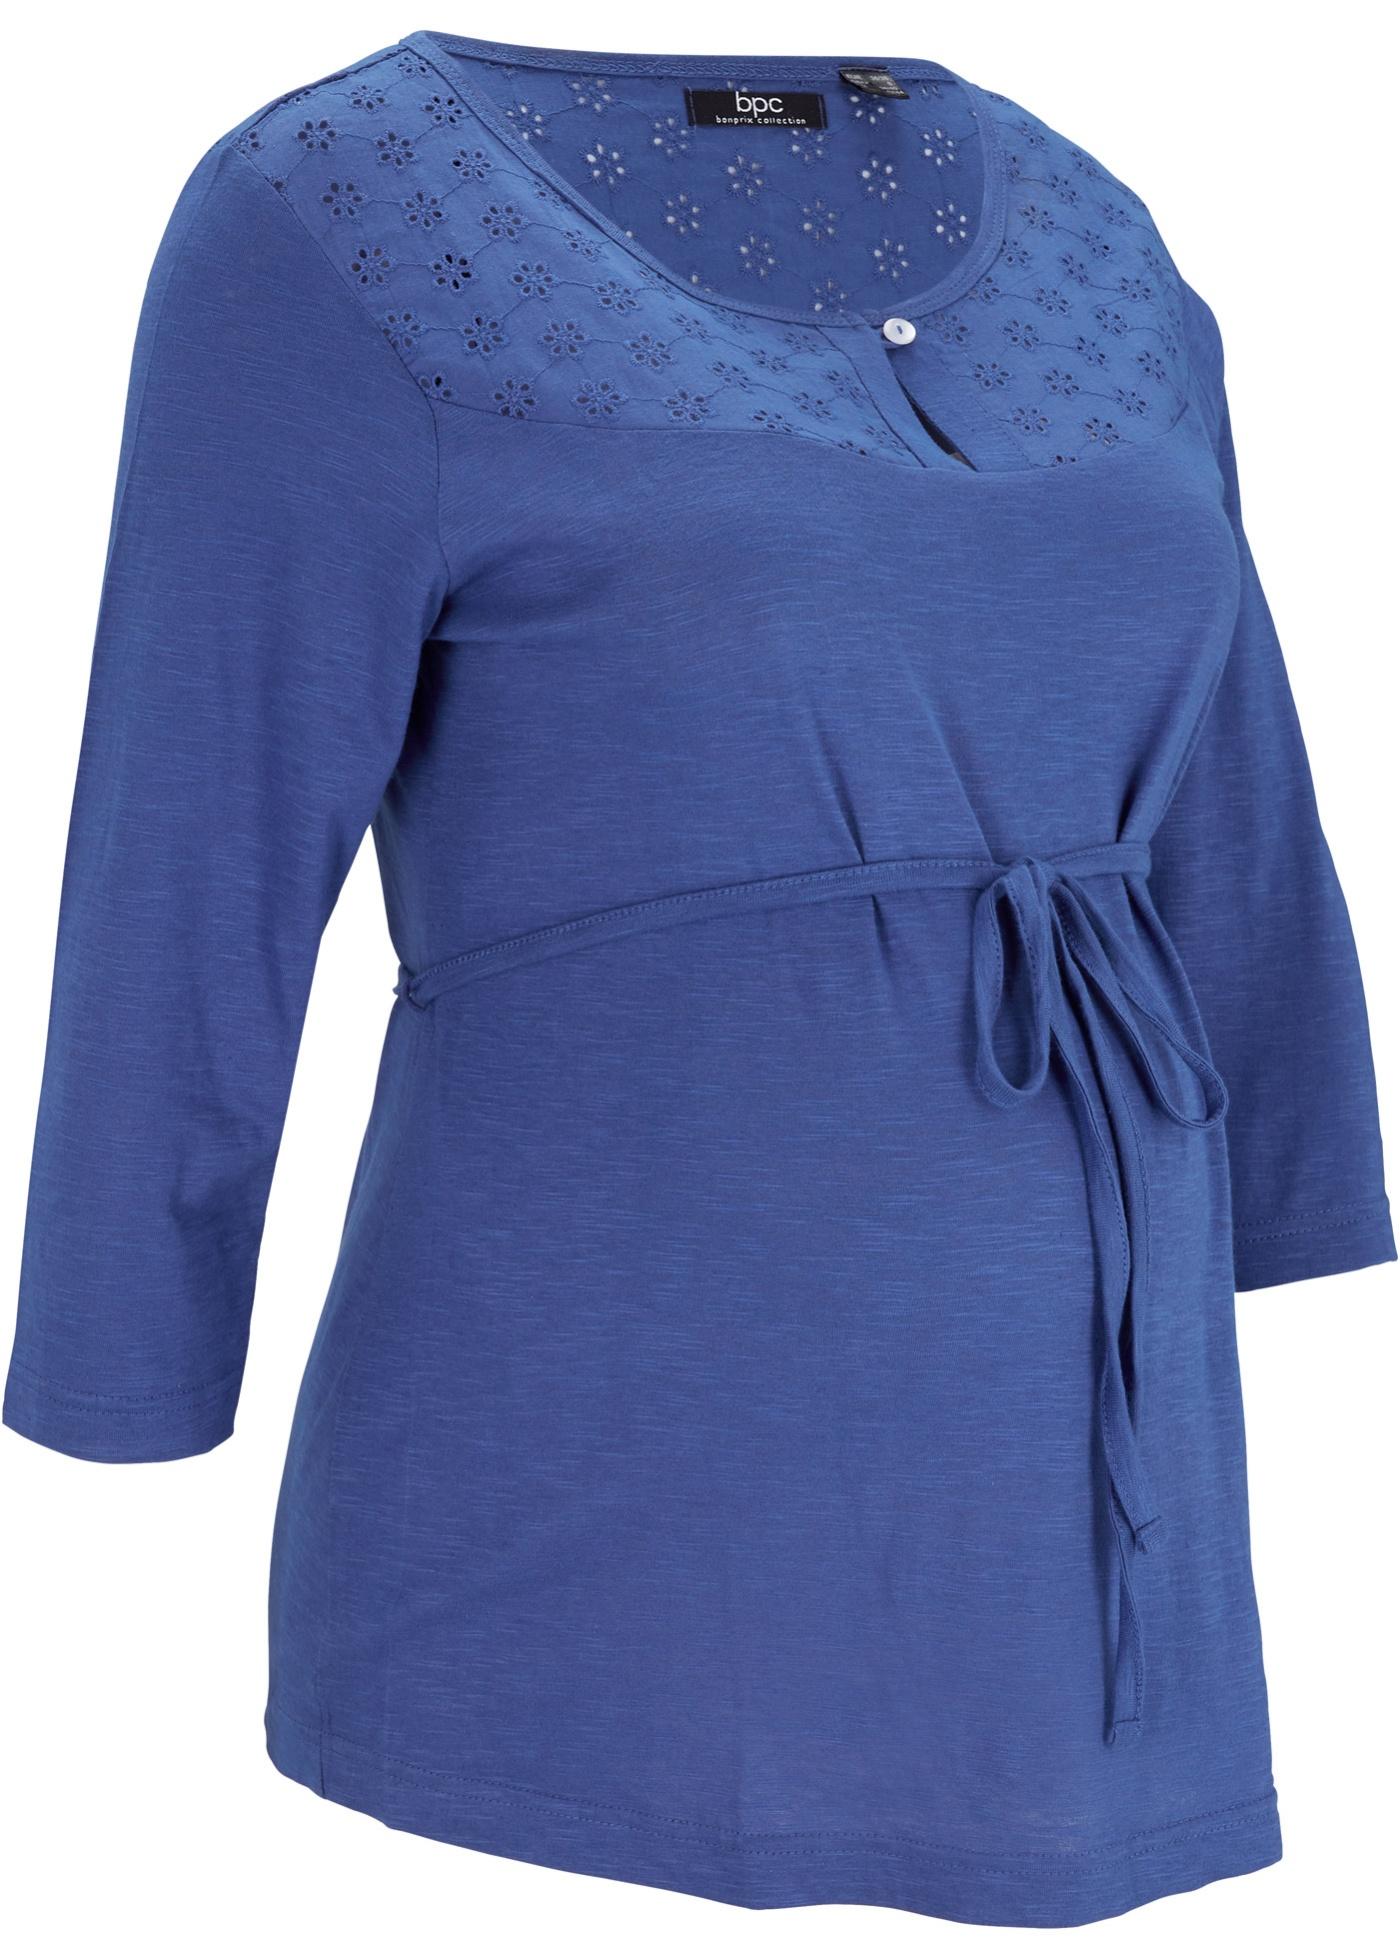 Maglia prémaman con ricamo traforato (Blu) - bpc bonprix collection